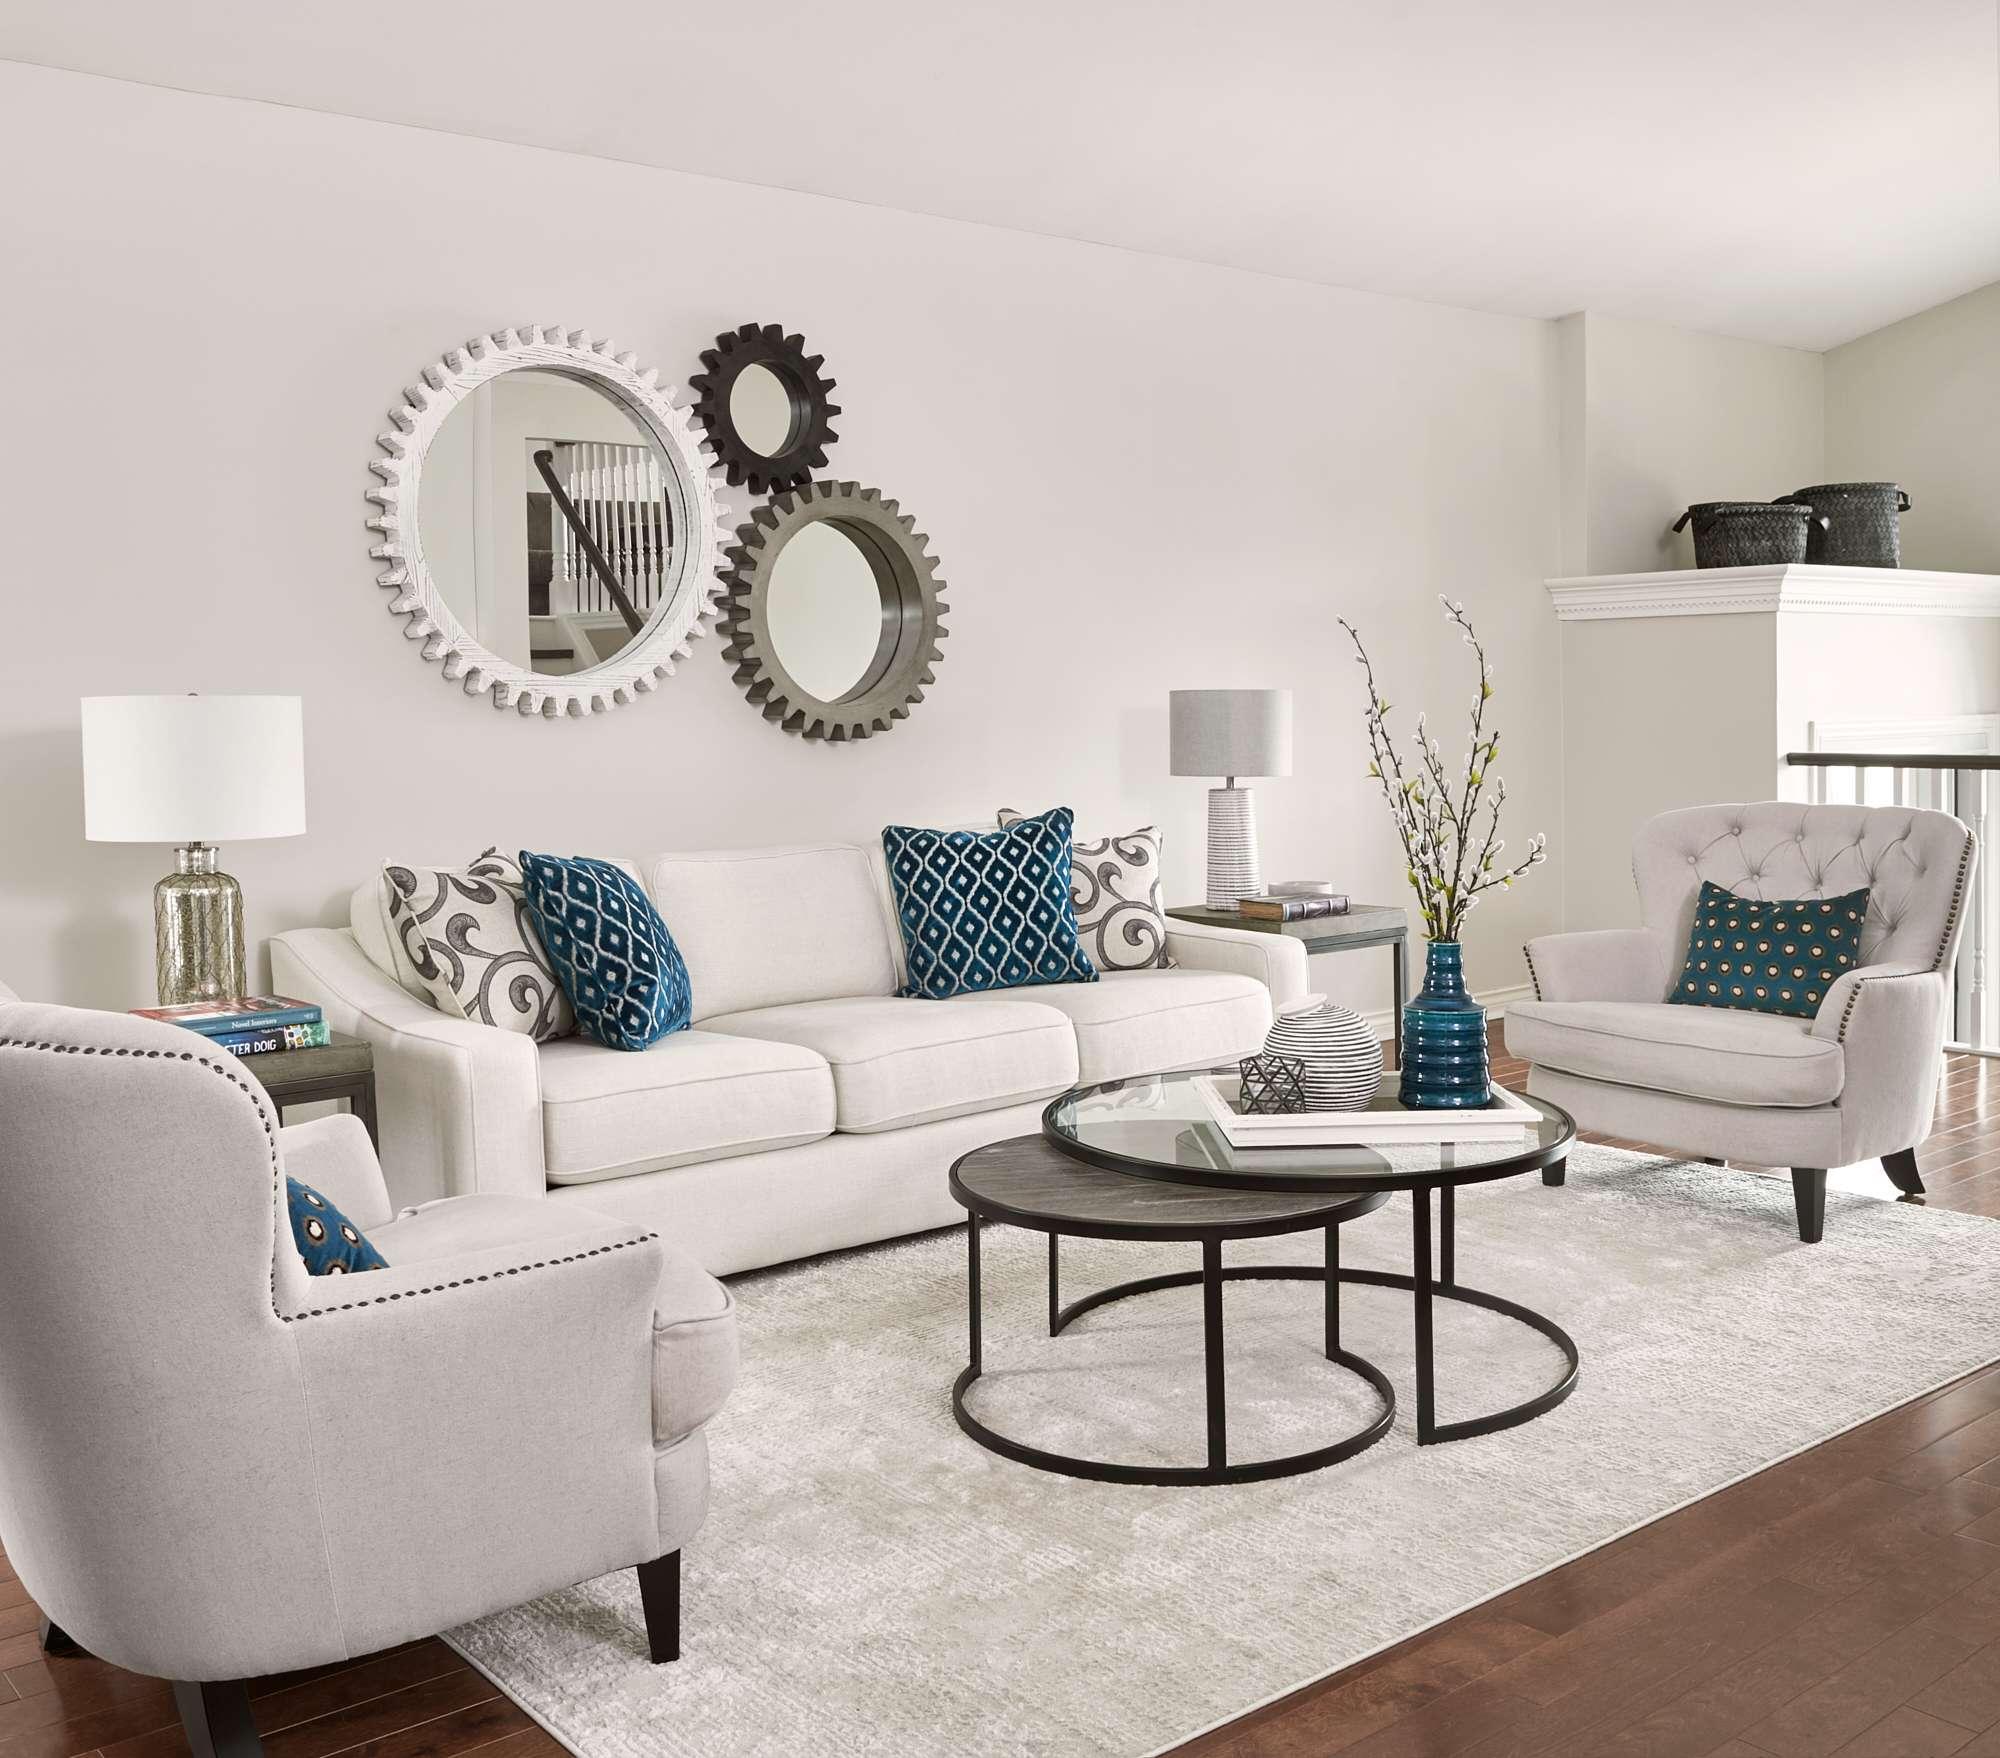 Great room interior decor teal accents orangeville